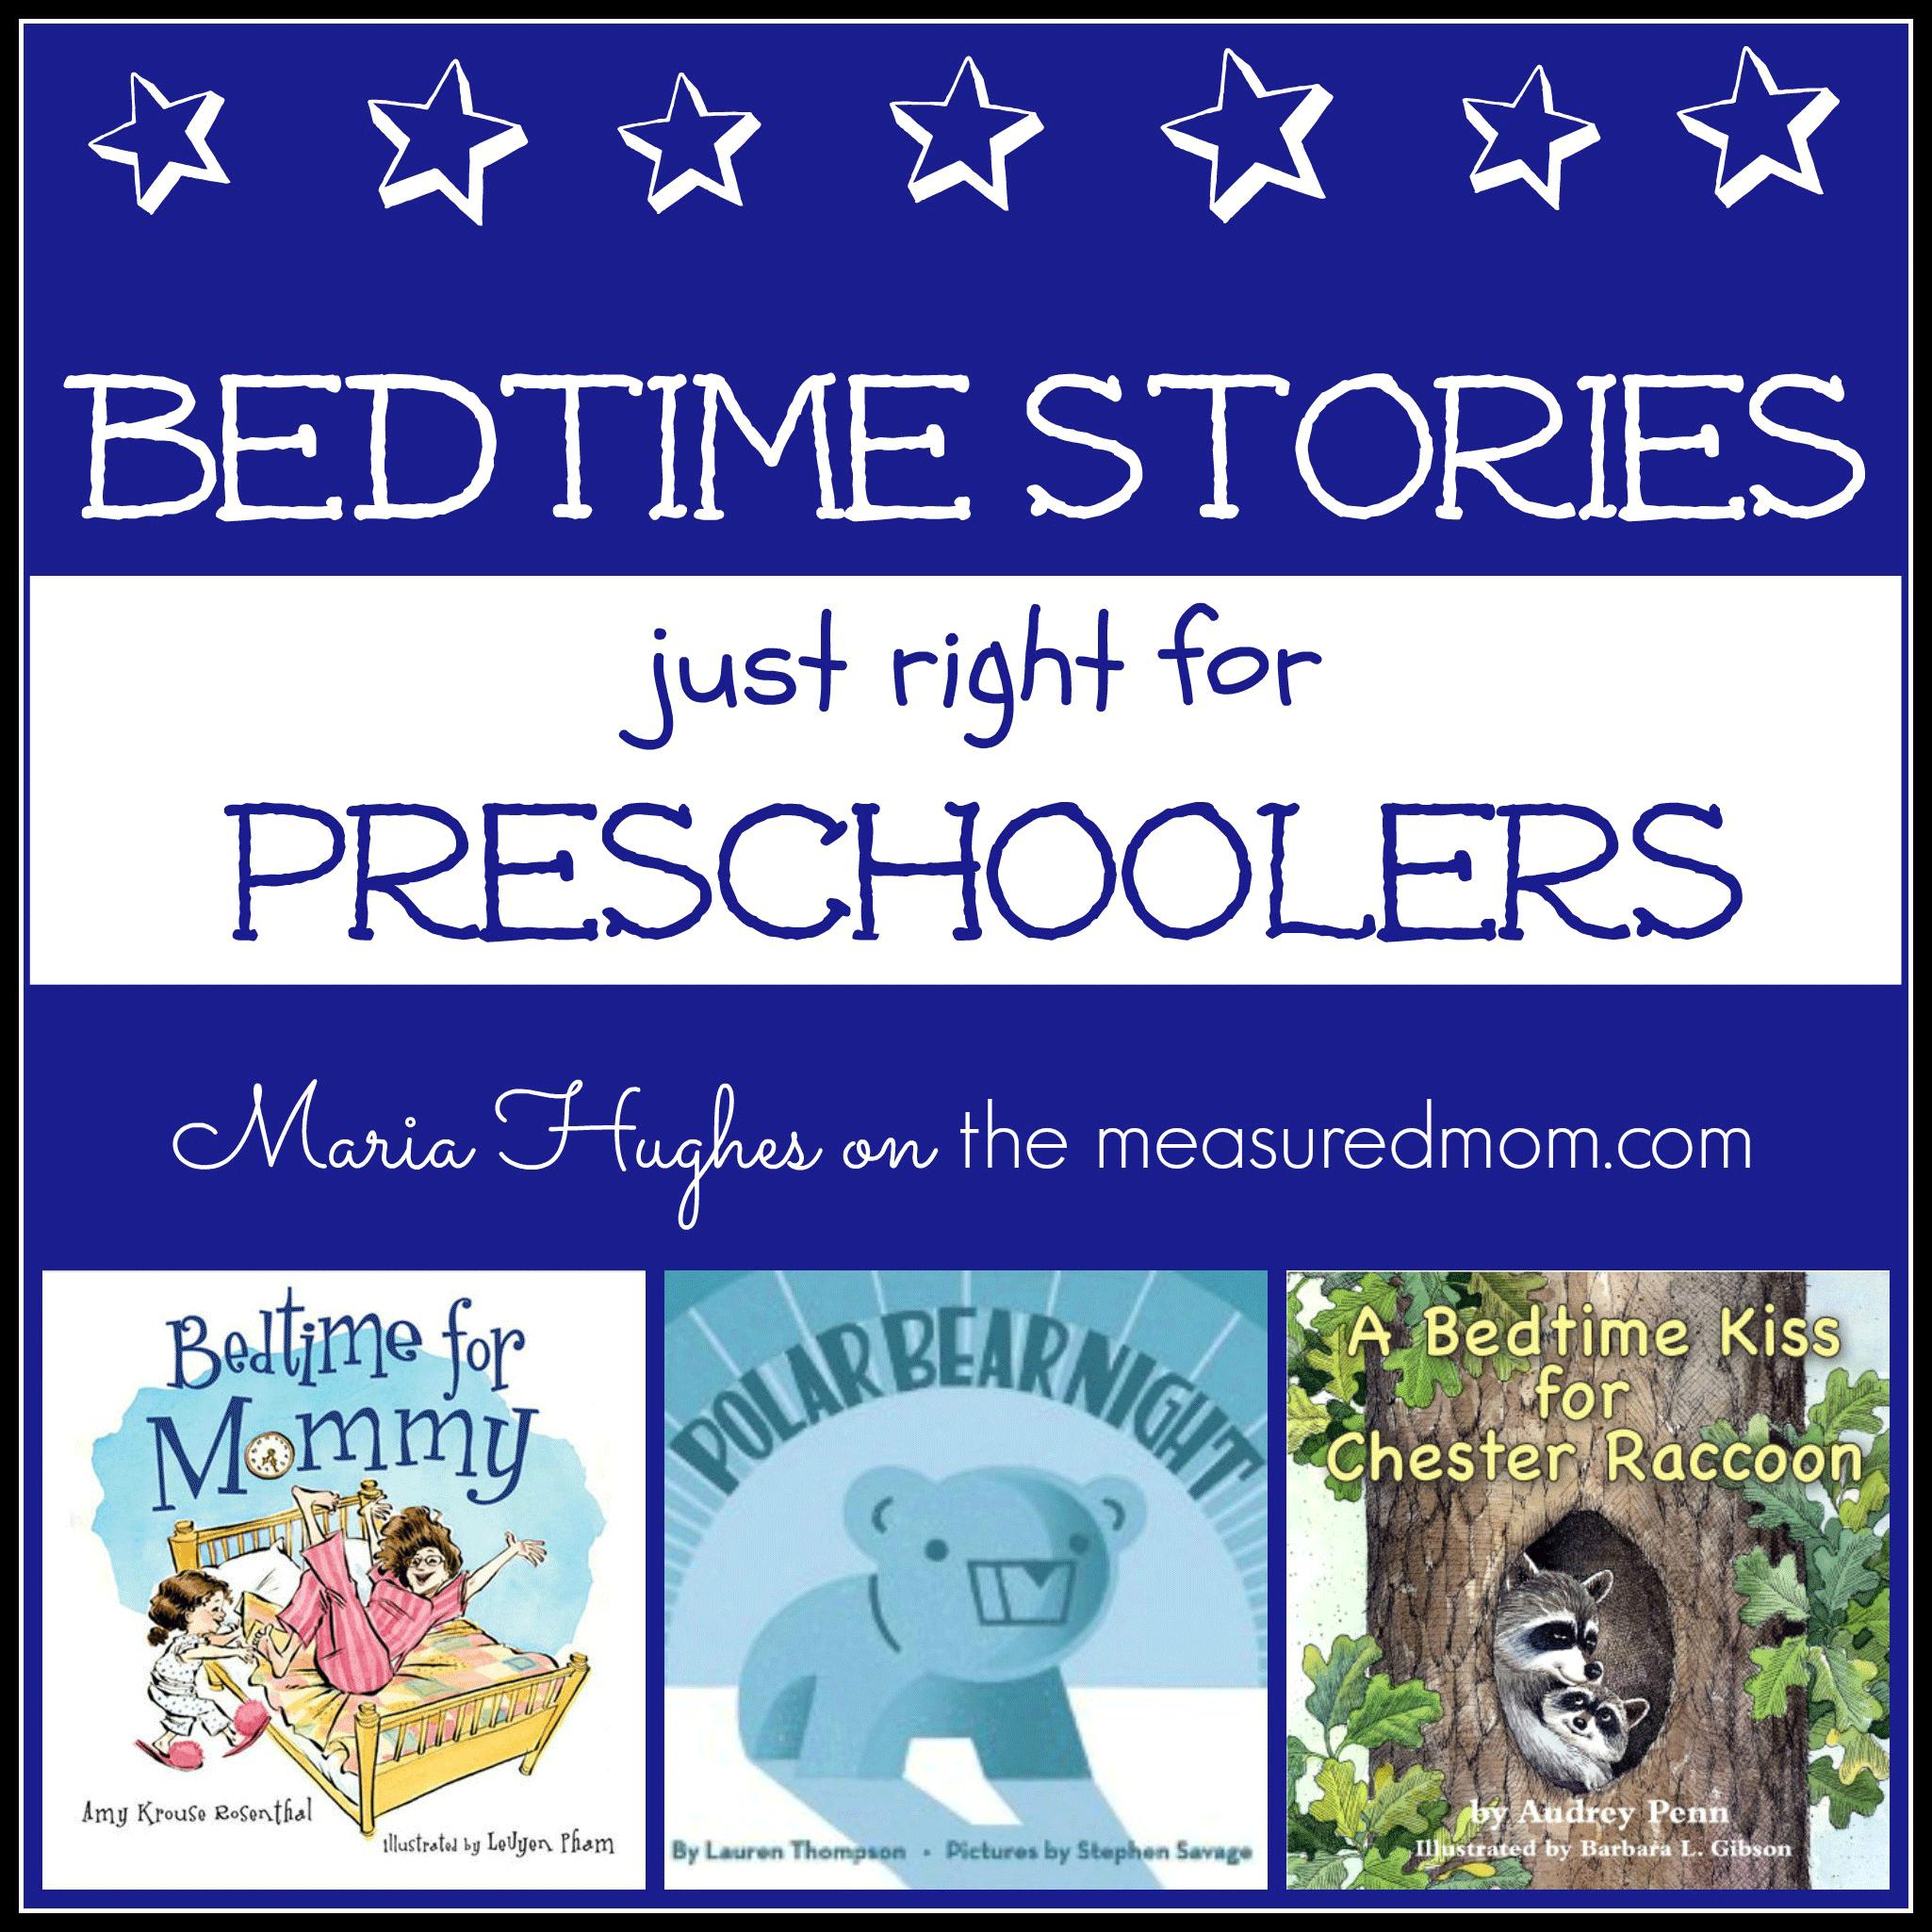 5 Bedtime Stories For Preschoolers - The Measured Mom - Free Printable Stories For Preschoolers